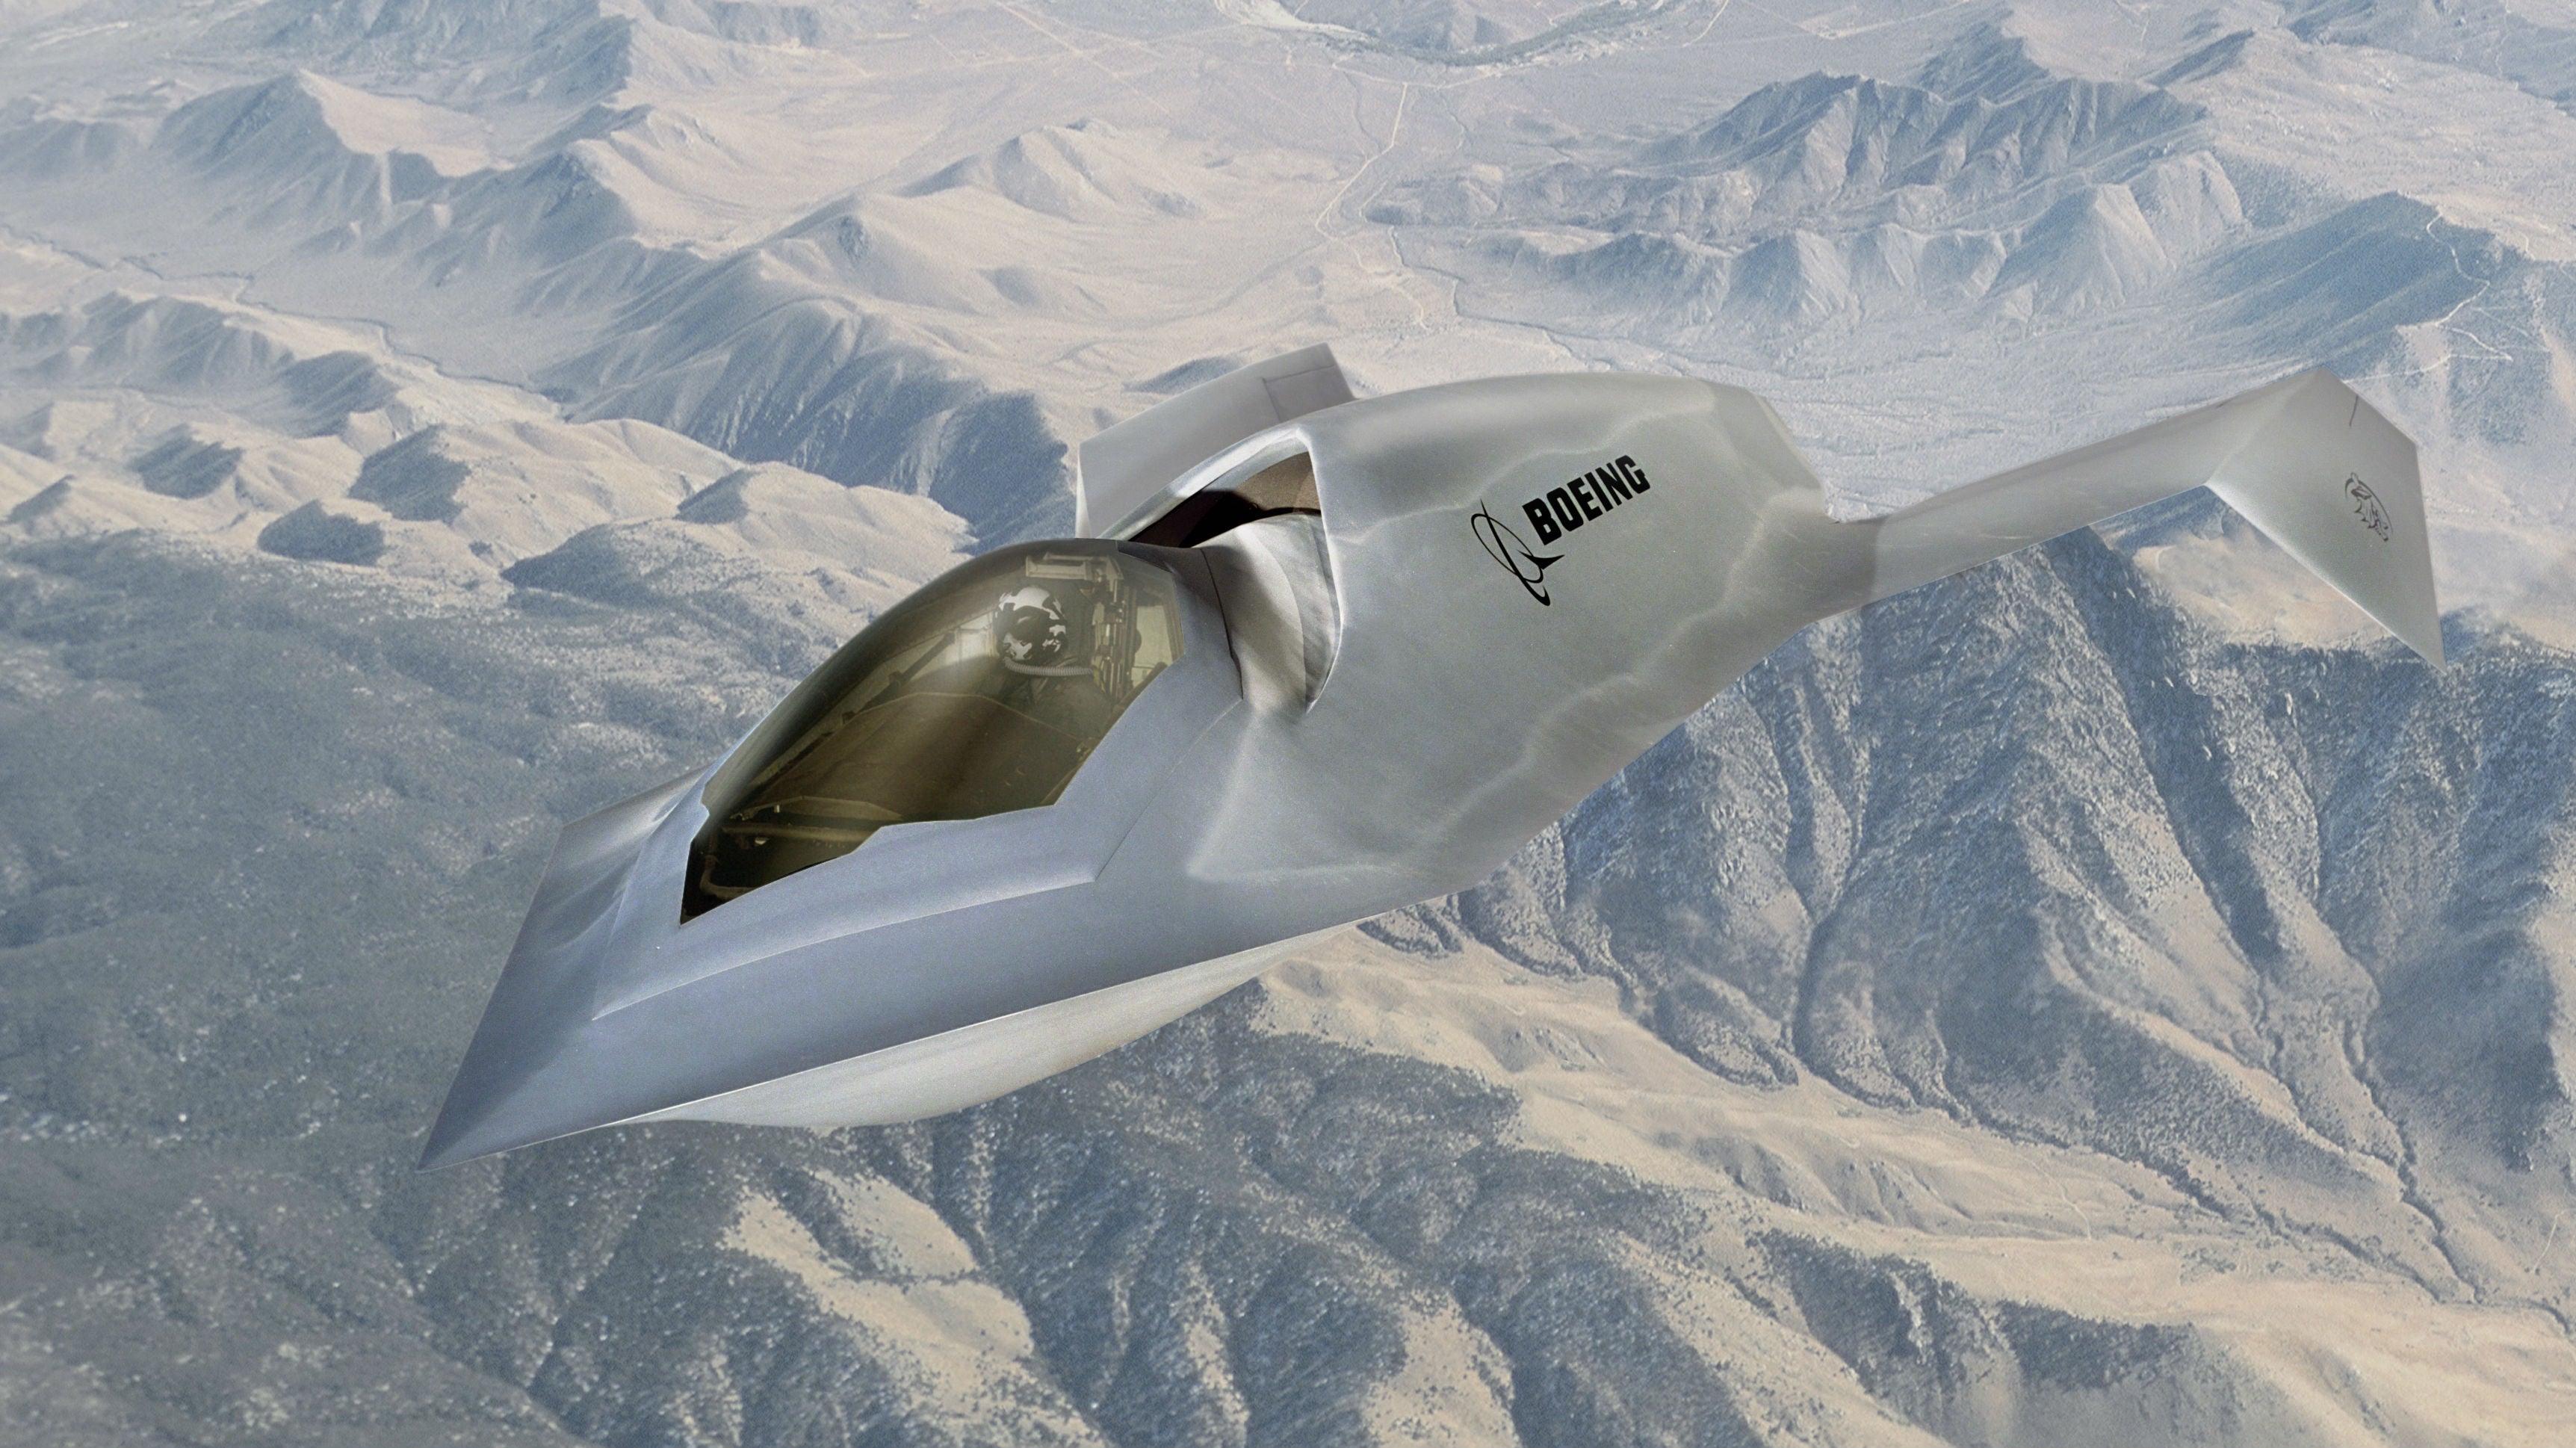 Boeing's Bird of Prey: A Prototype Jet Worthy of the Klingon Empire